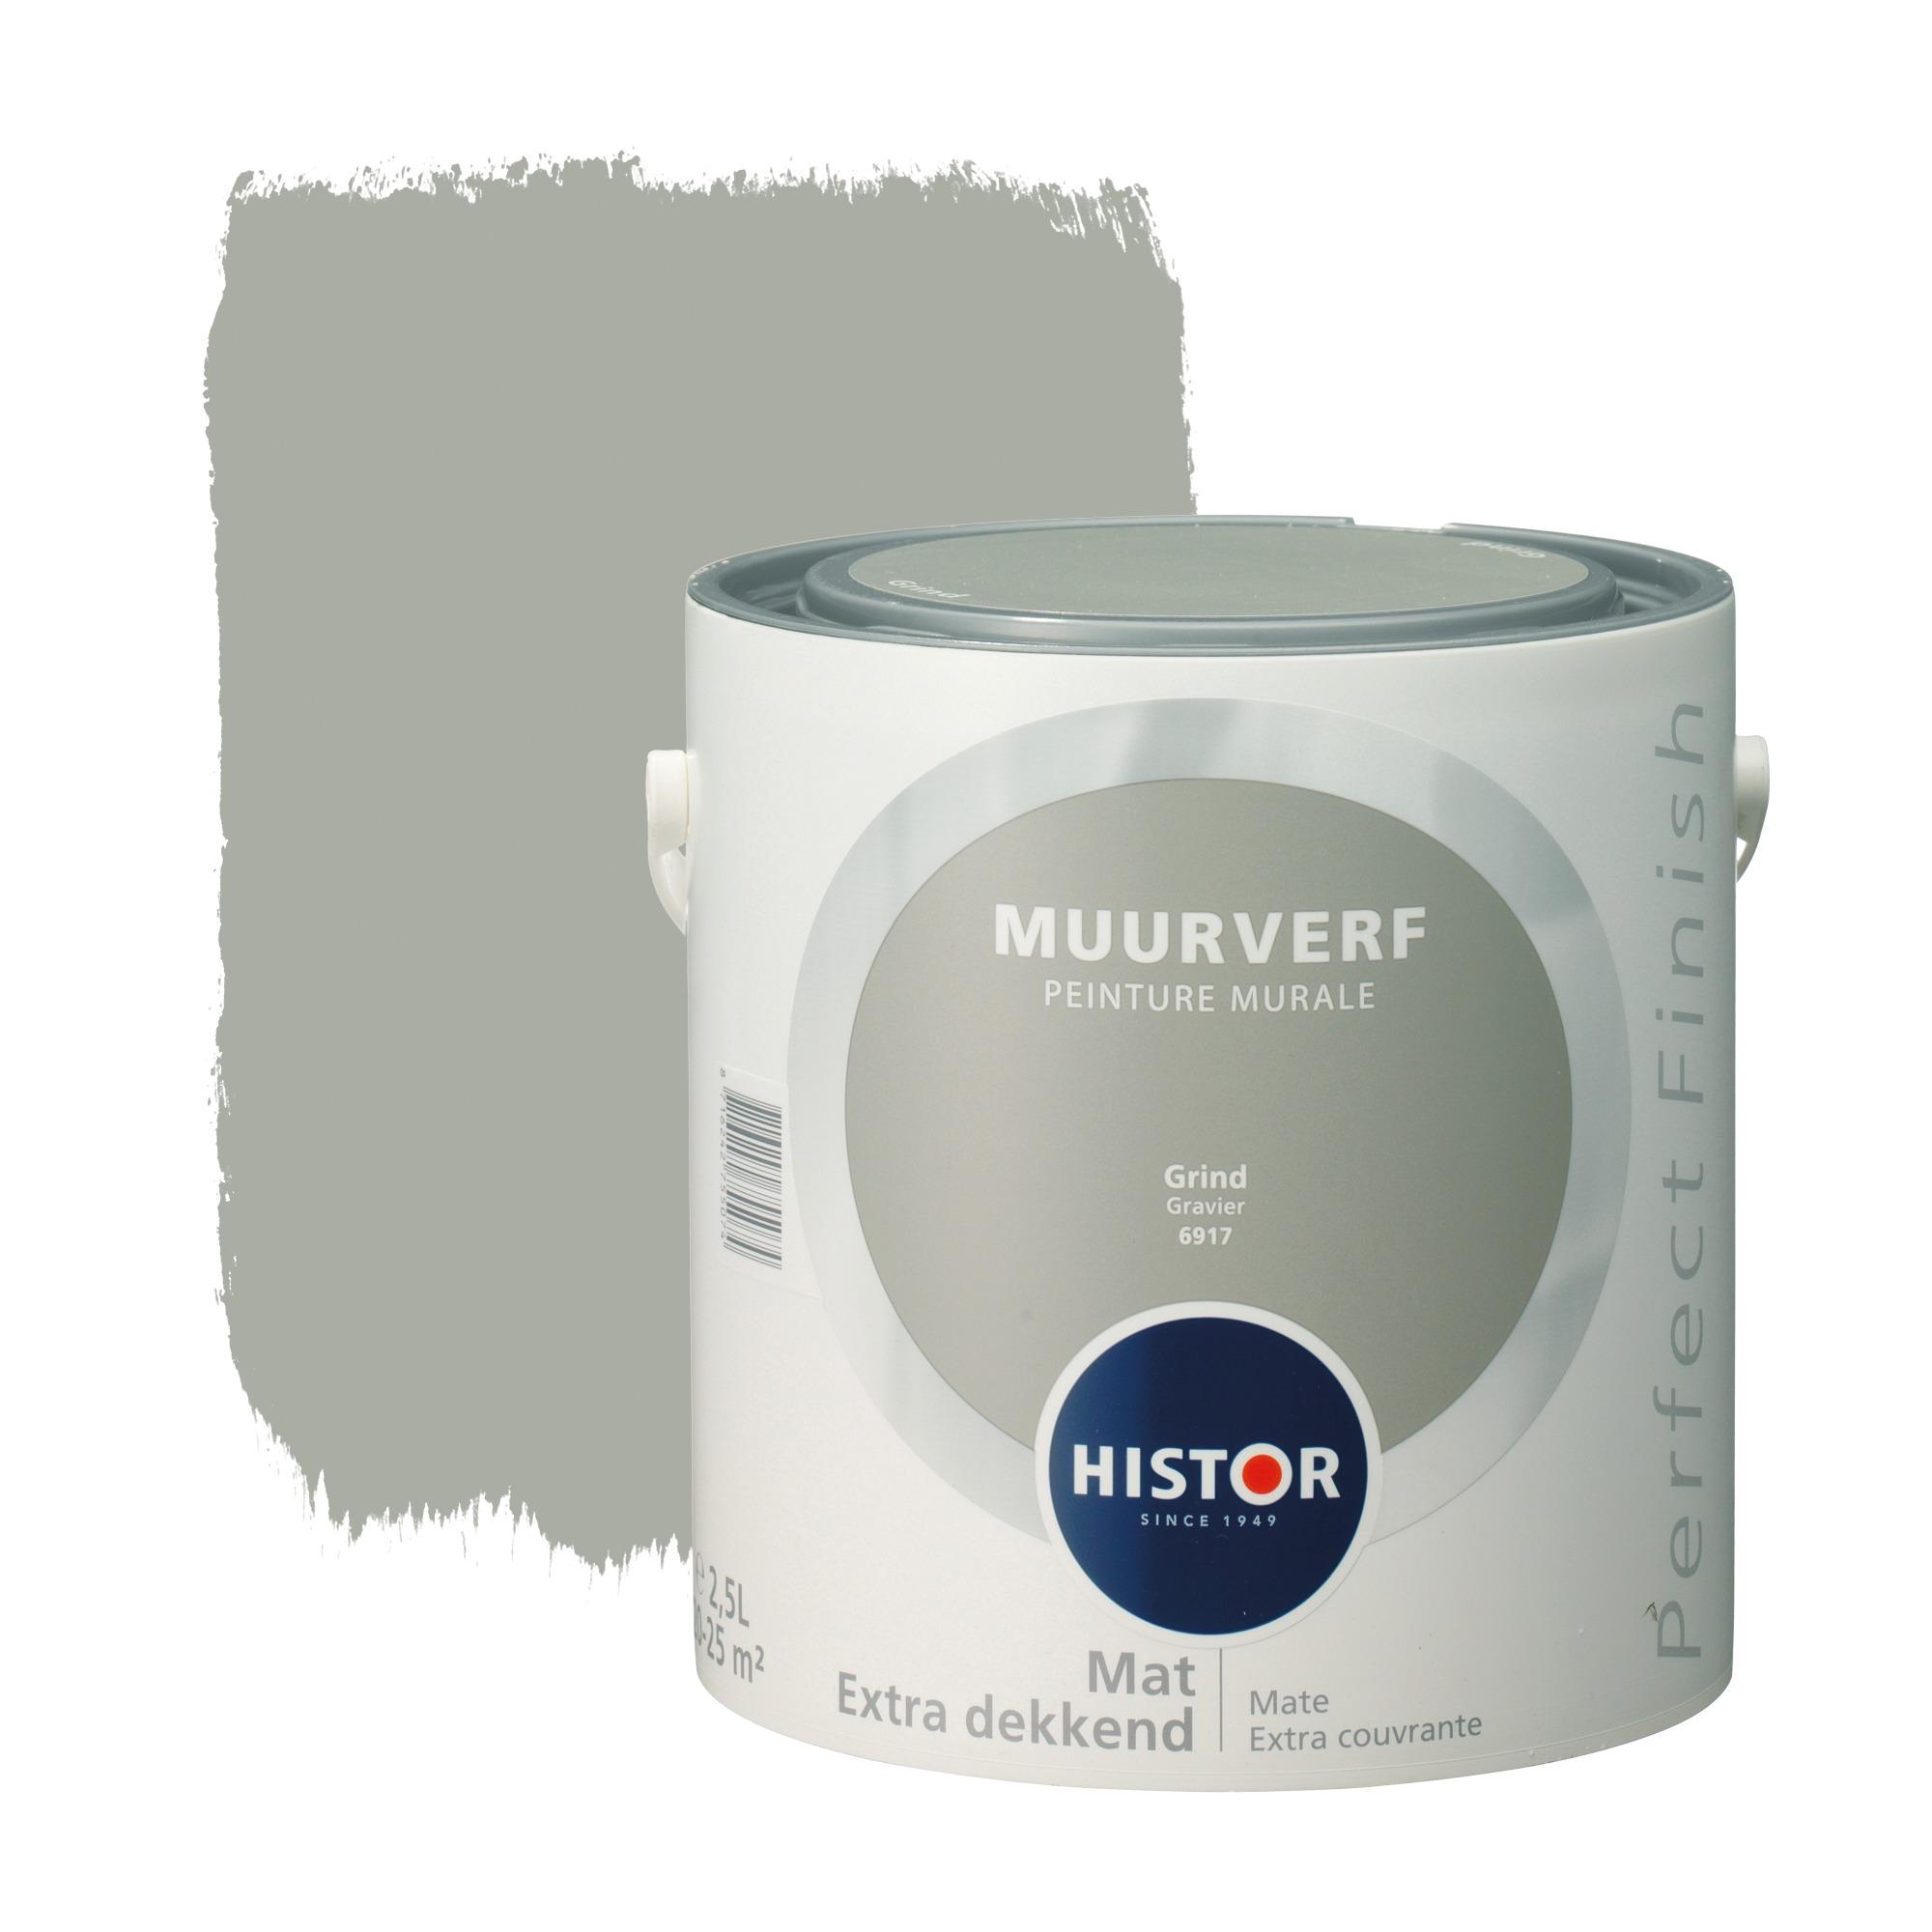 Histor Perfect Finish muurverf mat grind 2,5 l Muurverf